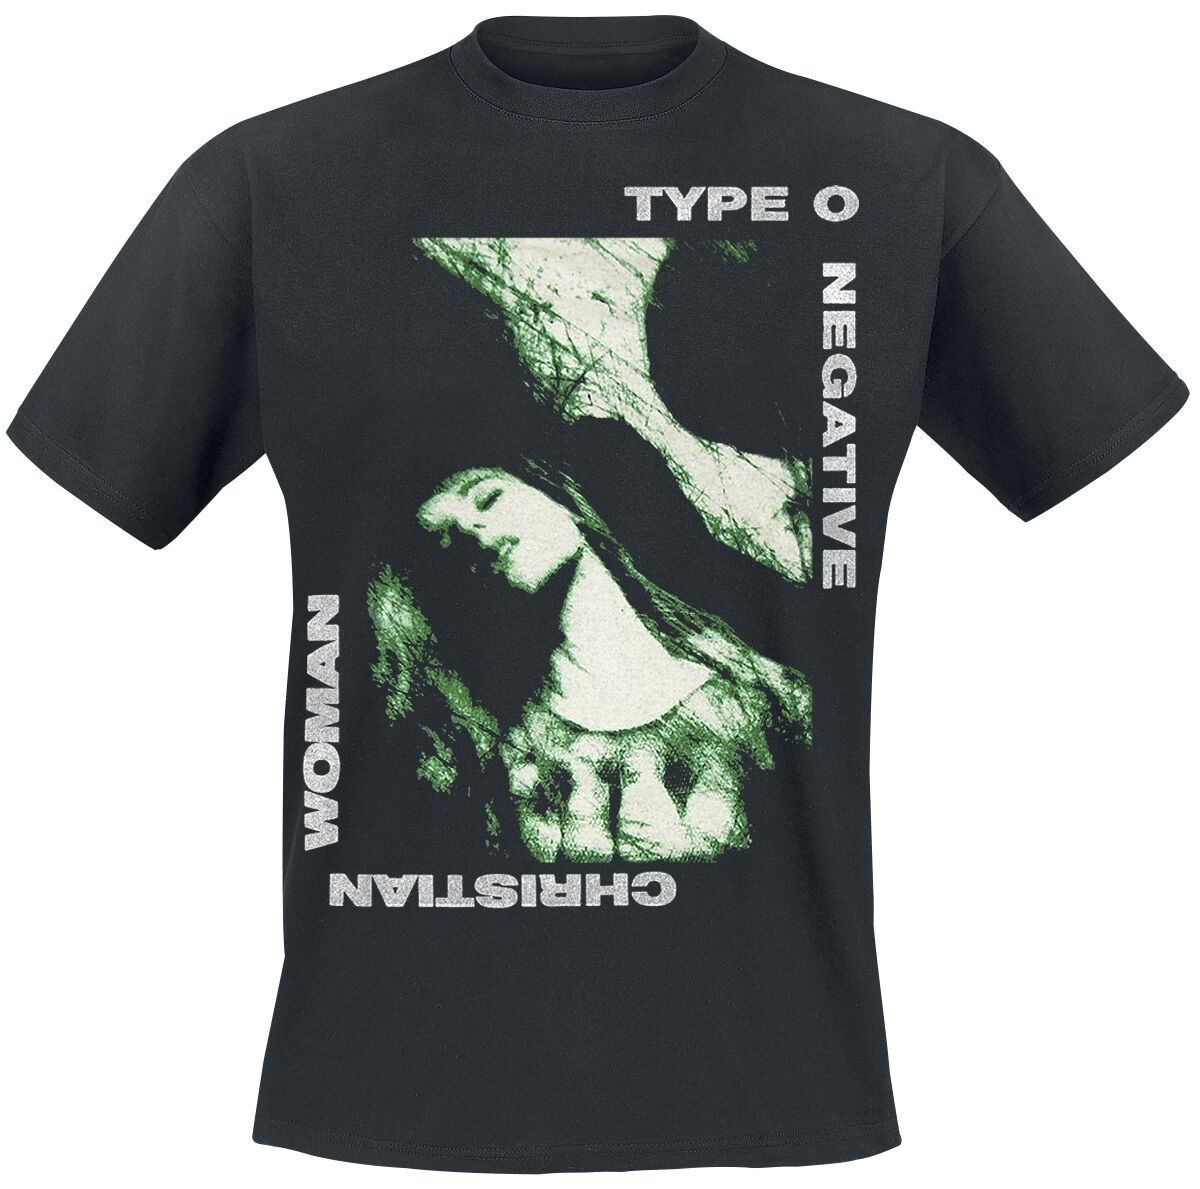 Zespoły - Koszulki - T-Shirt Type O Negative Christian Woman T-Shirt czarny - 339072